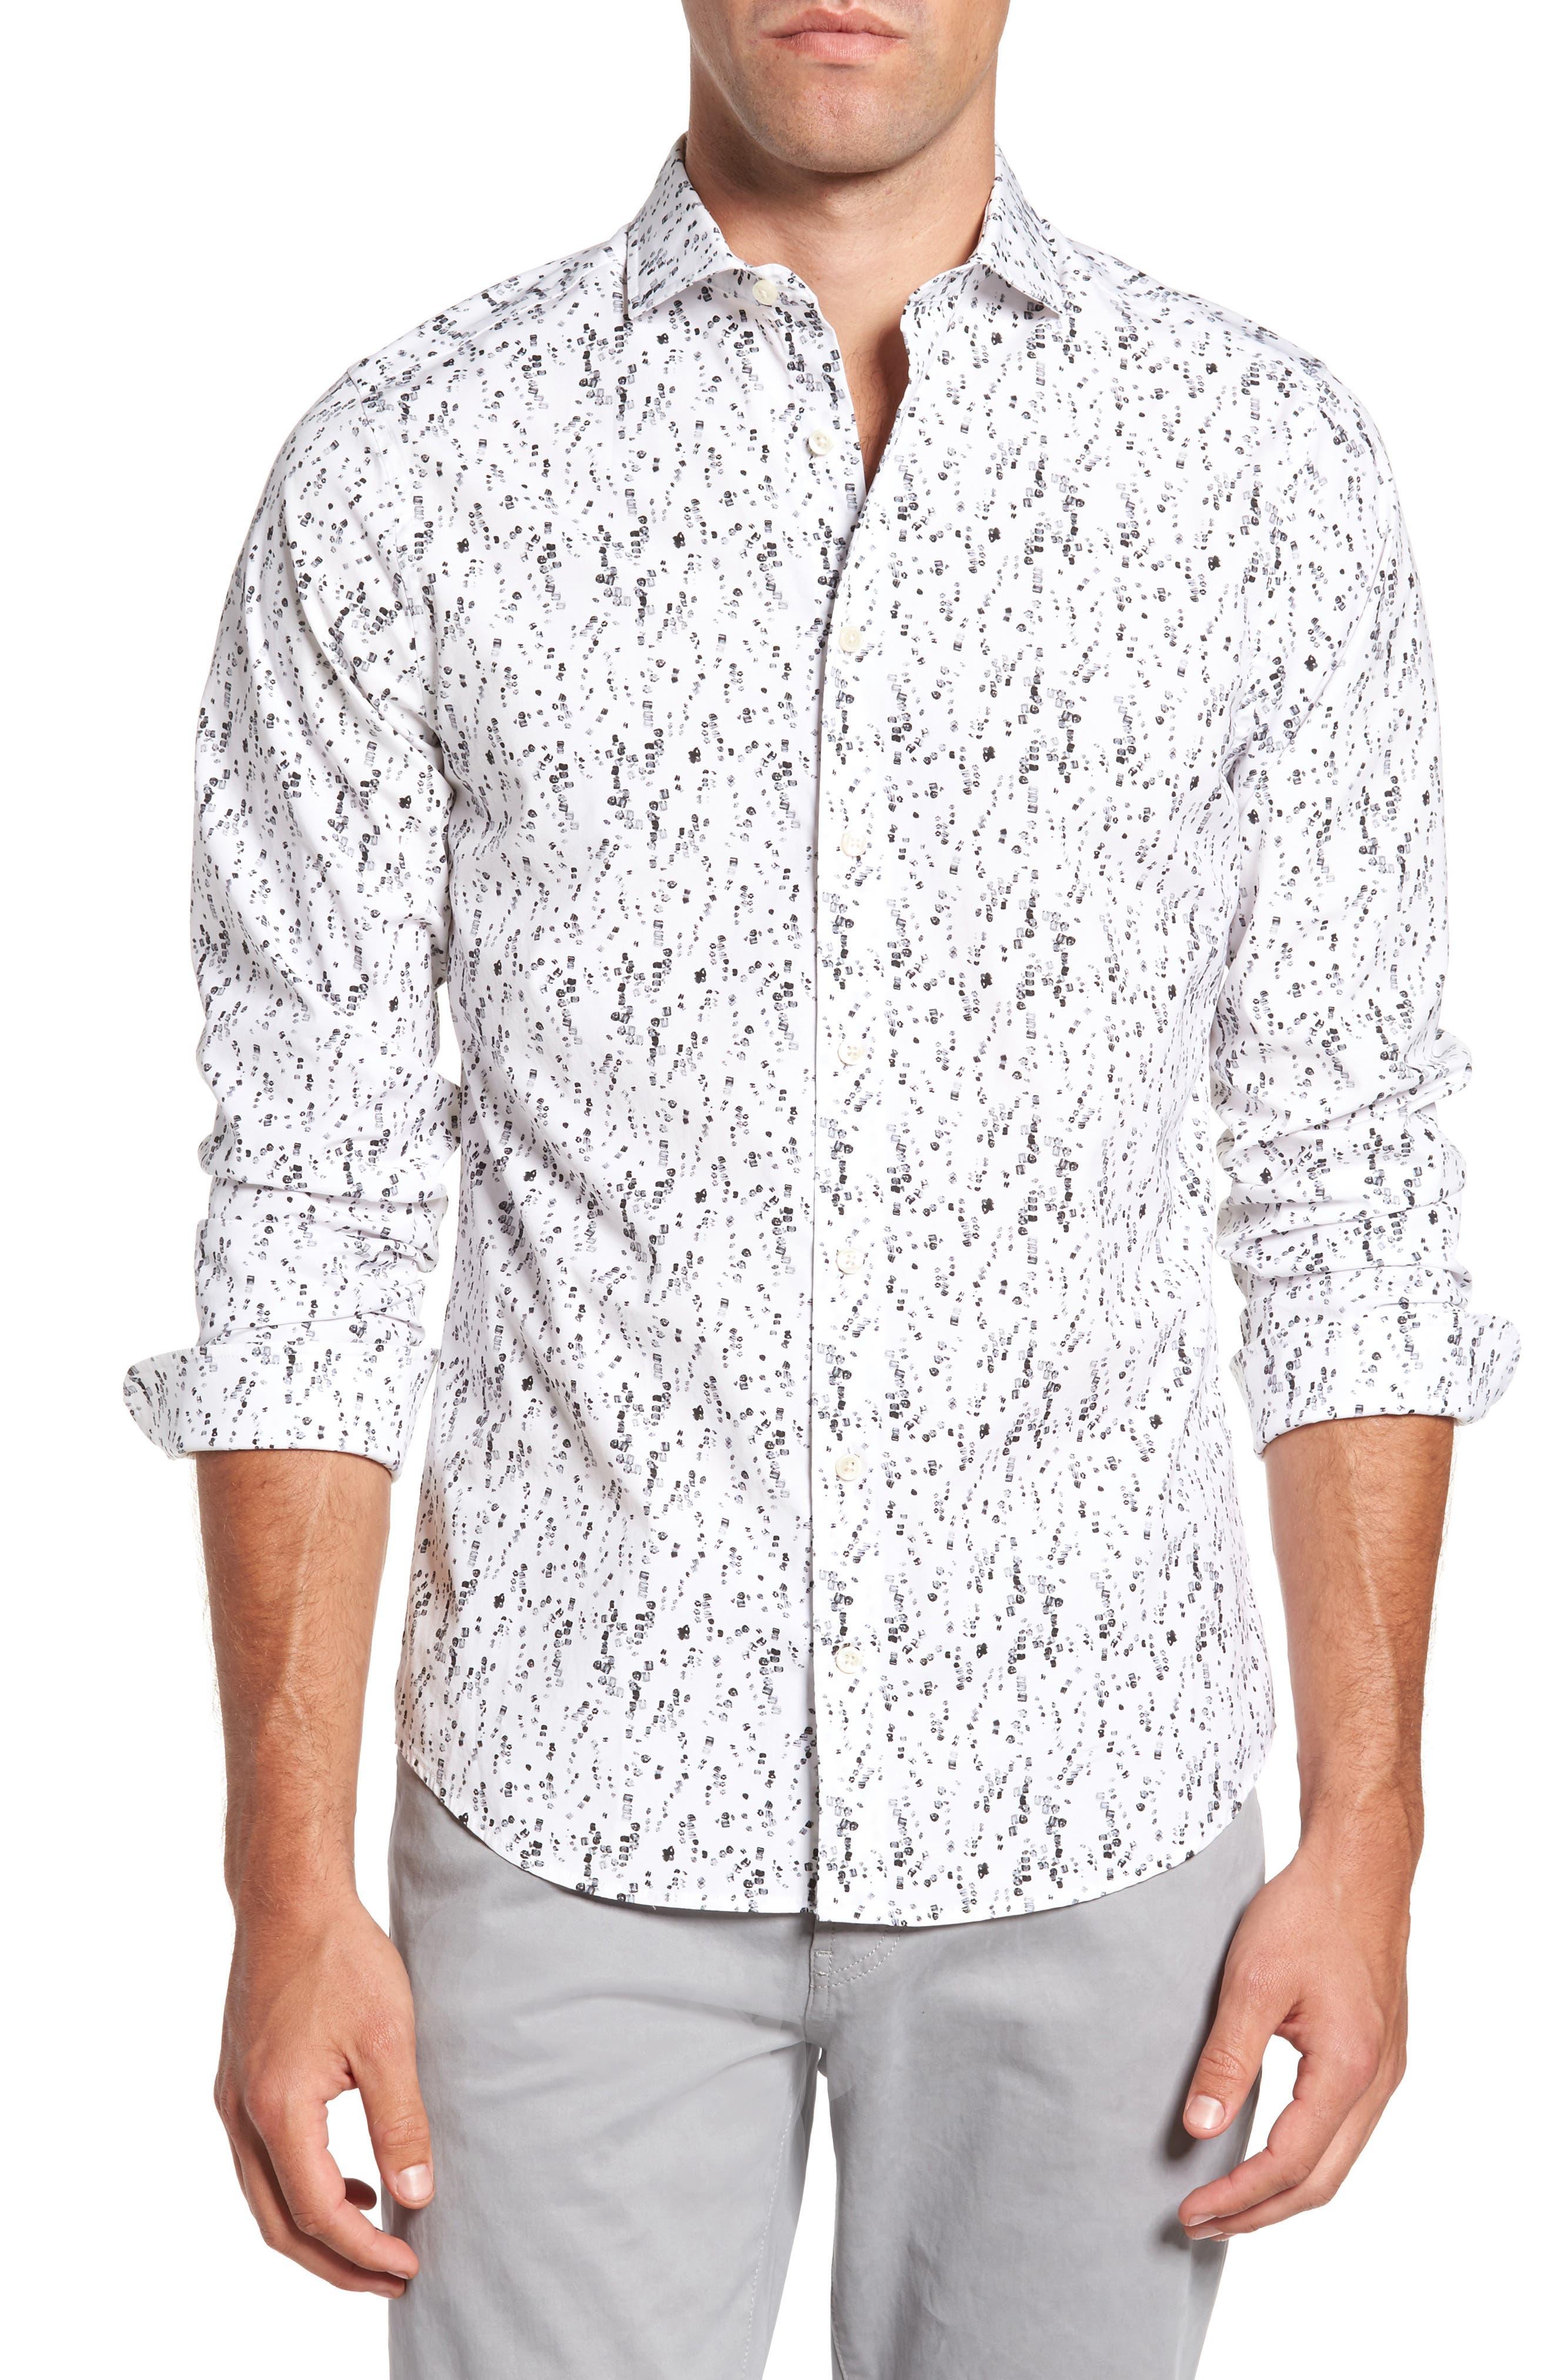 Alternate Image 1 Selected - Gant Slim Fit Crushed Ice Print Sport Shirt